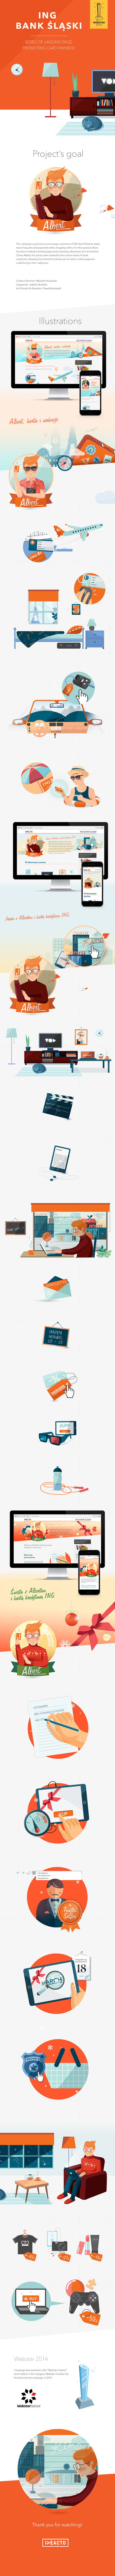 landing page ideacto Advertisin digita Creative Design online payment campaig loyality program ing bank